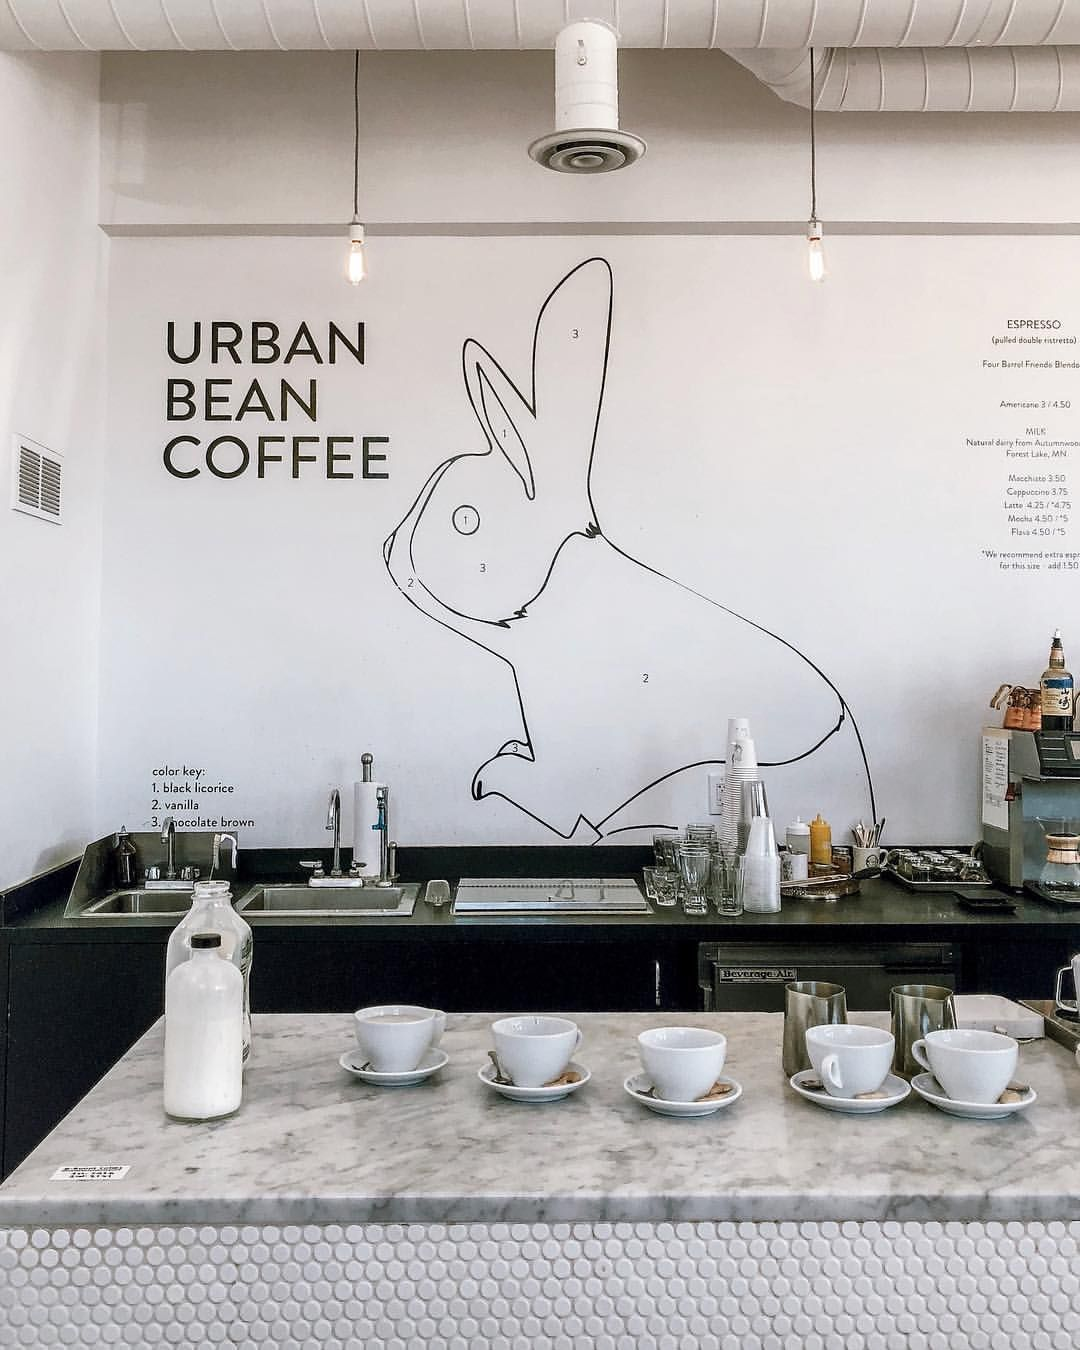 Urban Bean Coffee In Minneapolis Cold Brew Coffee Maker Coffee Colour Coffee Shop